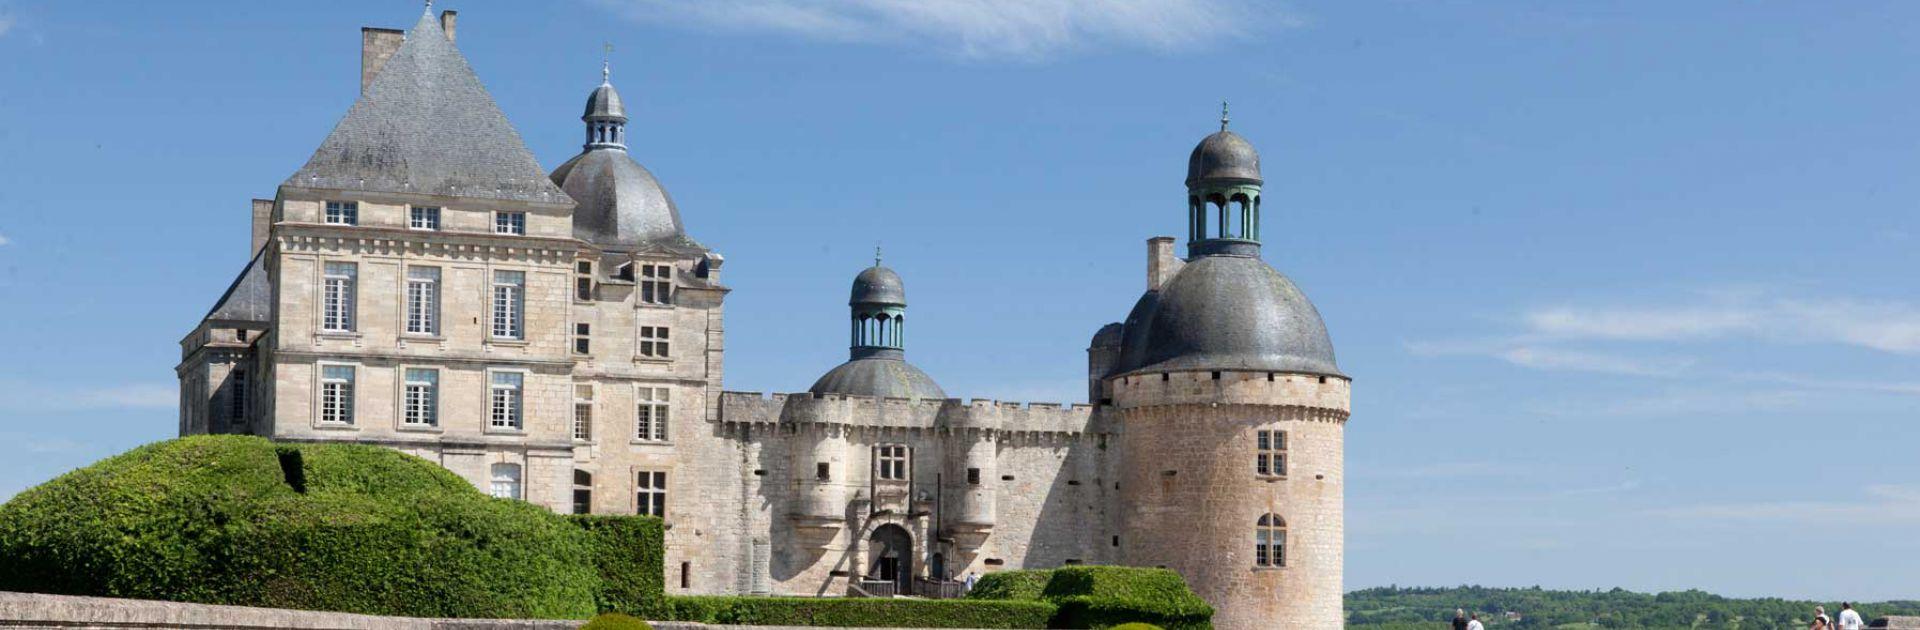 château Hautefort Périgord Vert Dordogne Jardins